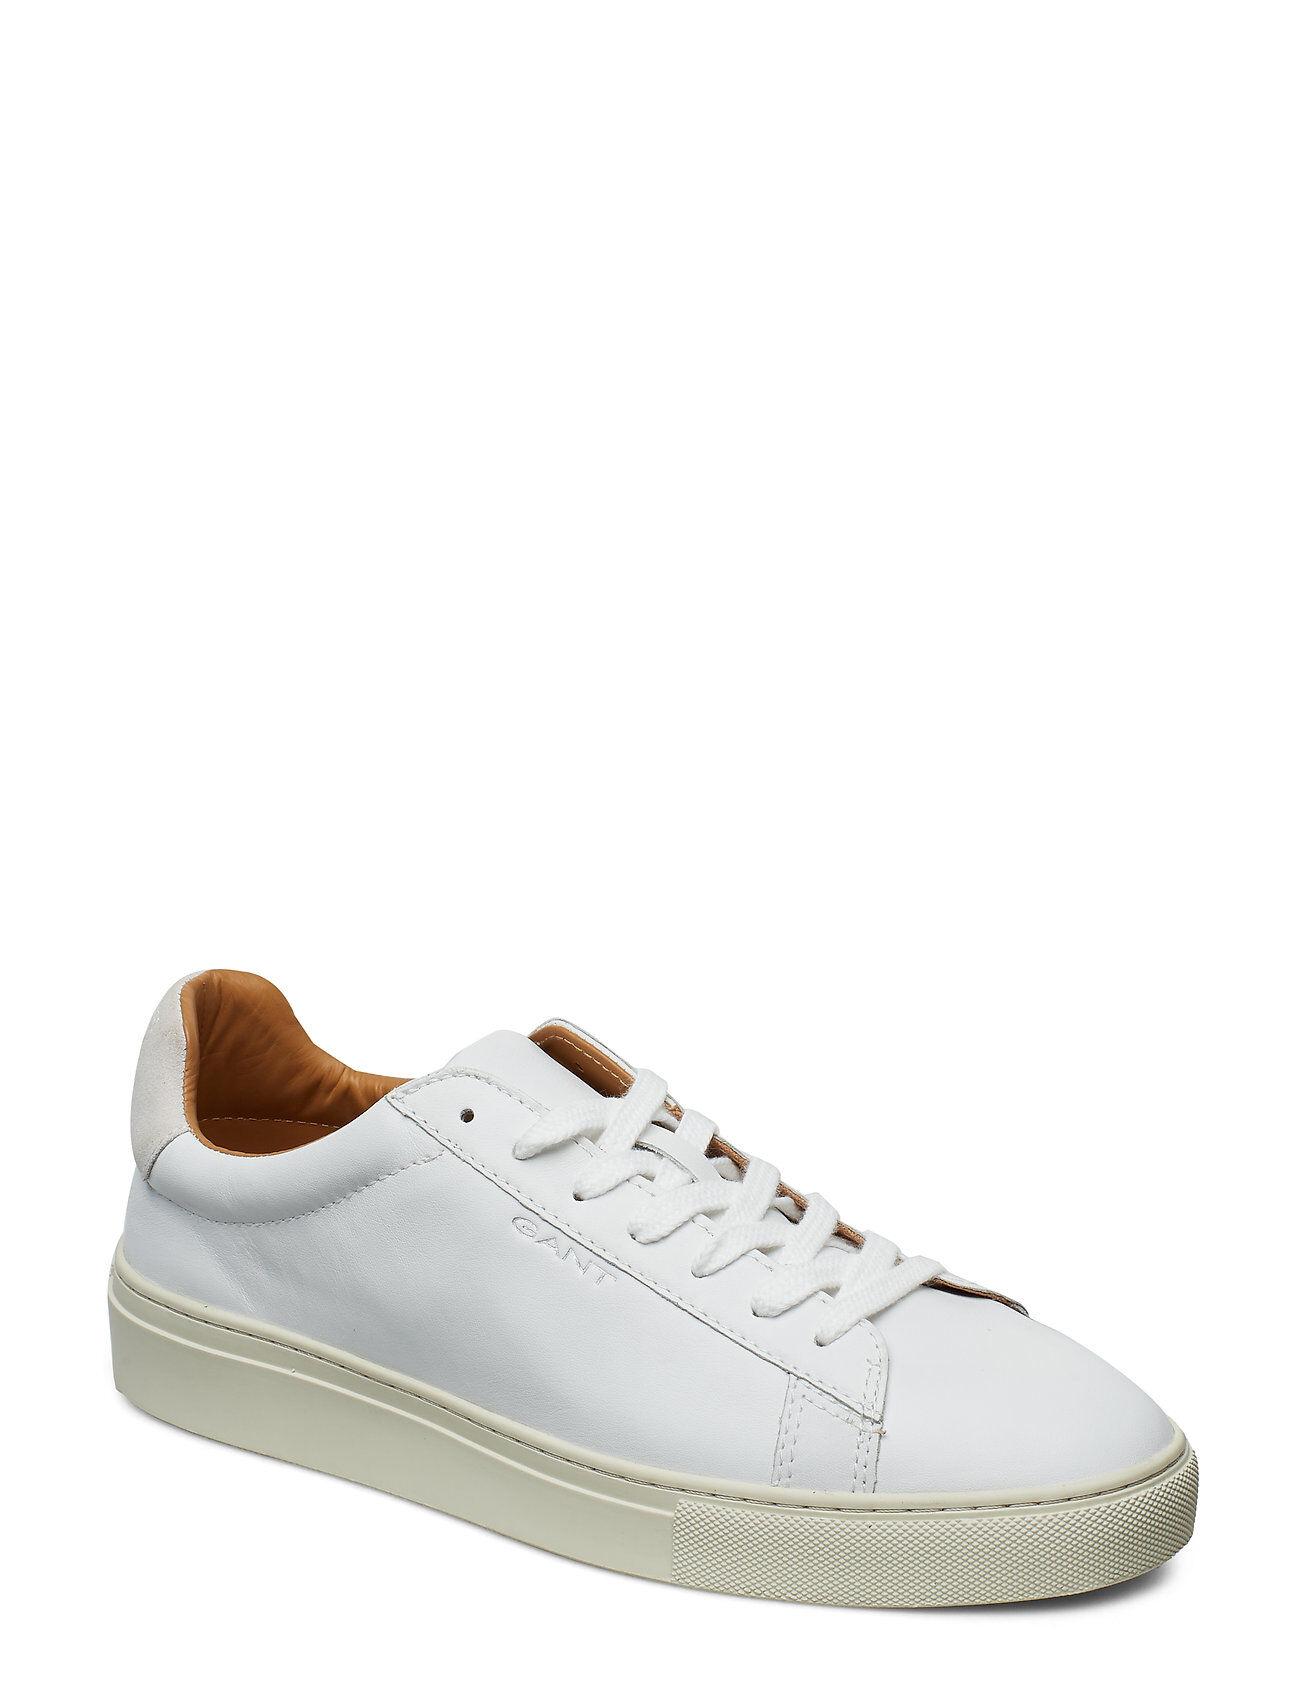 GANT Denver Cupsole Low Matalavartiset Sneakerit Tennarit Valkoinen GANT